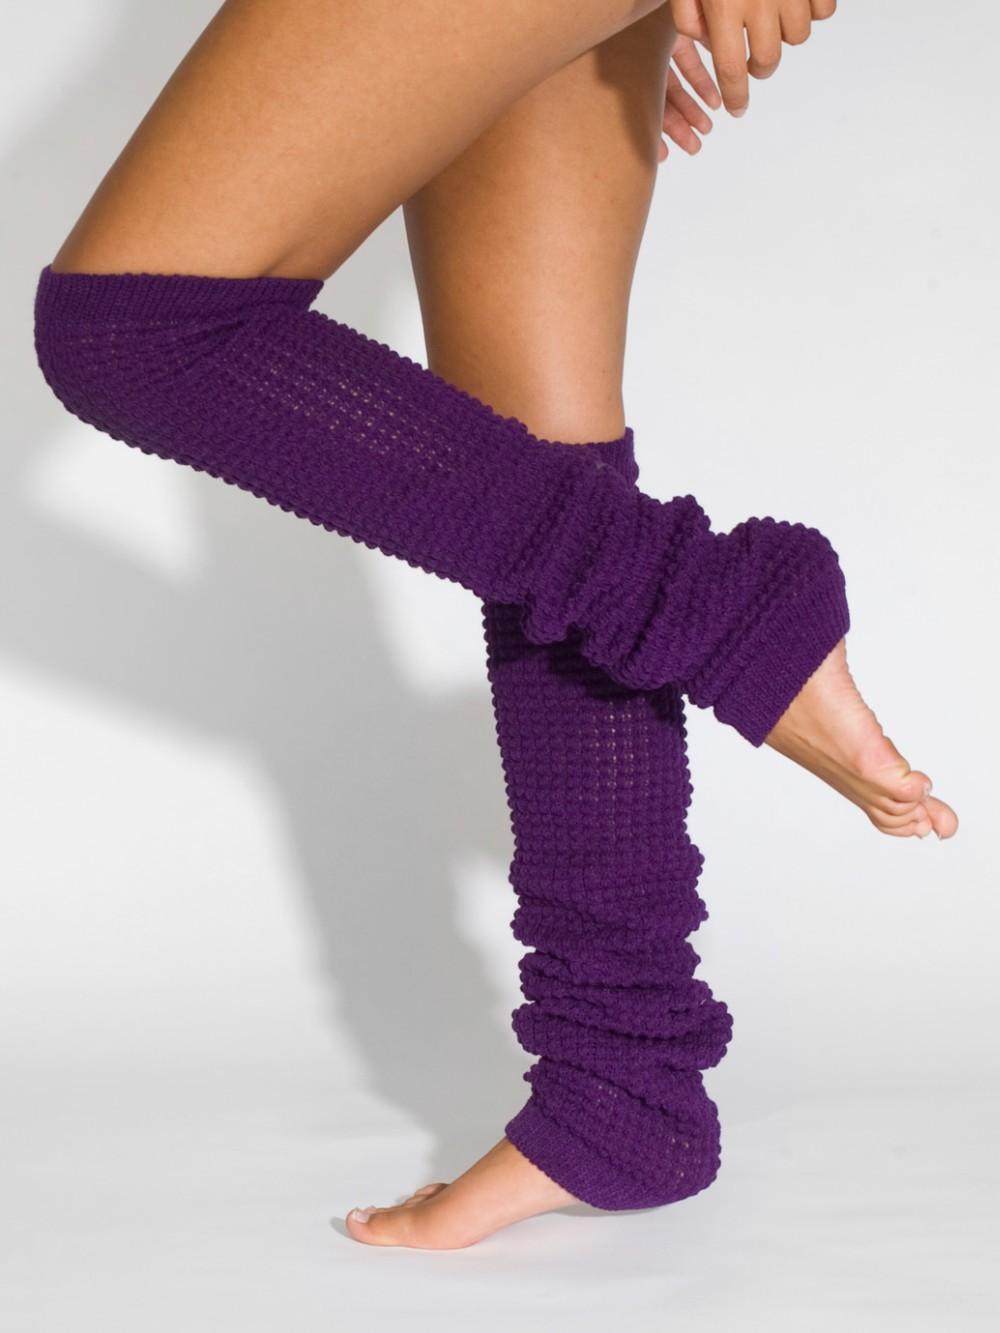 American-Apparel-Long-Leg-Warmer-Female-Purple.jpg